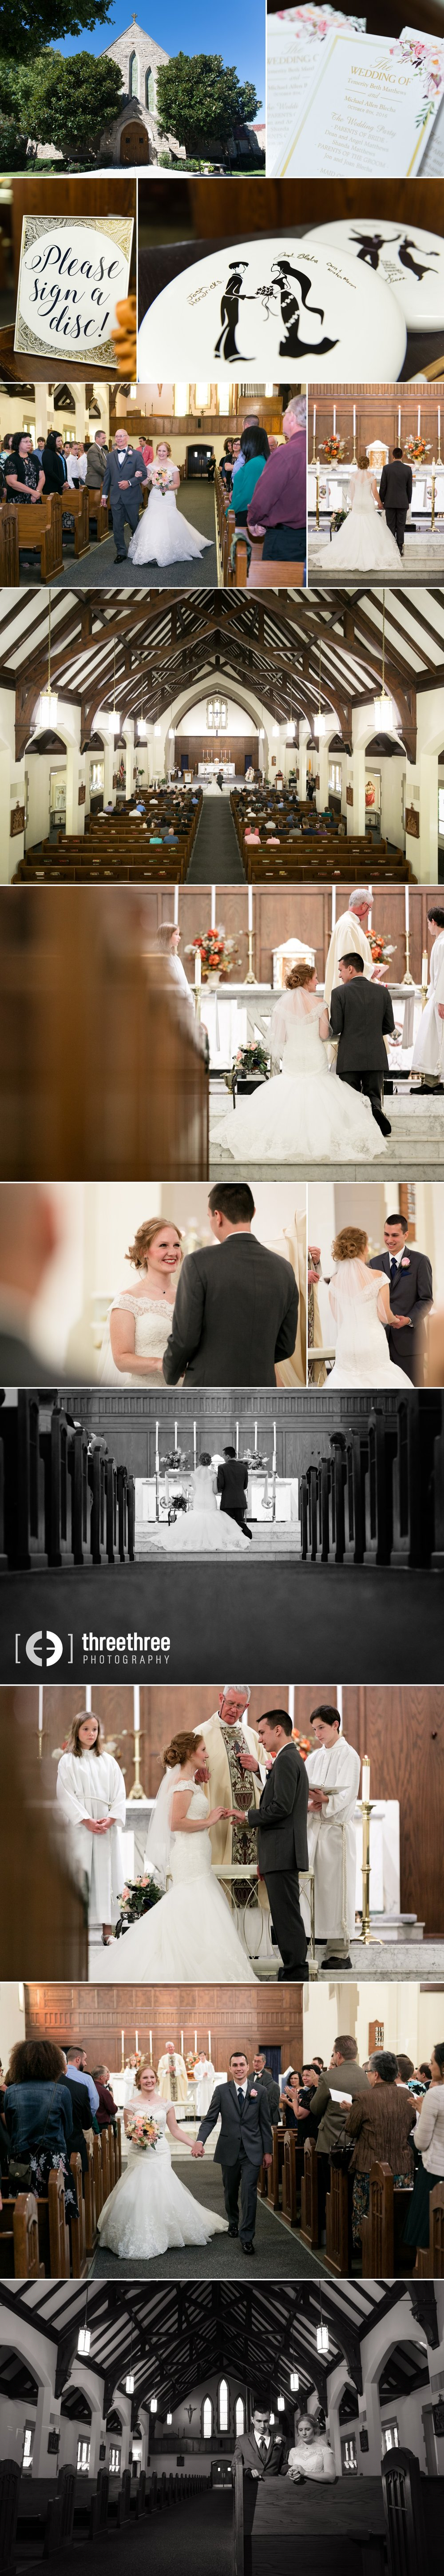 Temerity_KC Wedding Photography 3.jpg